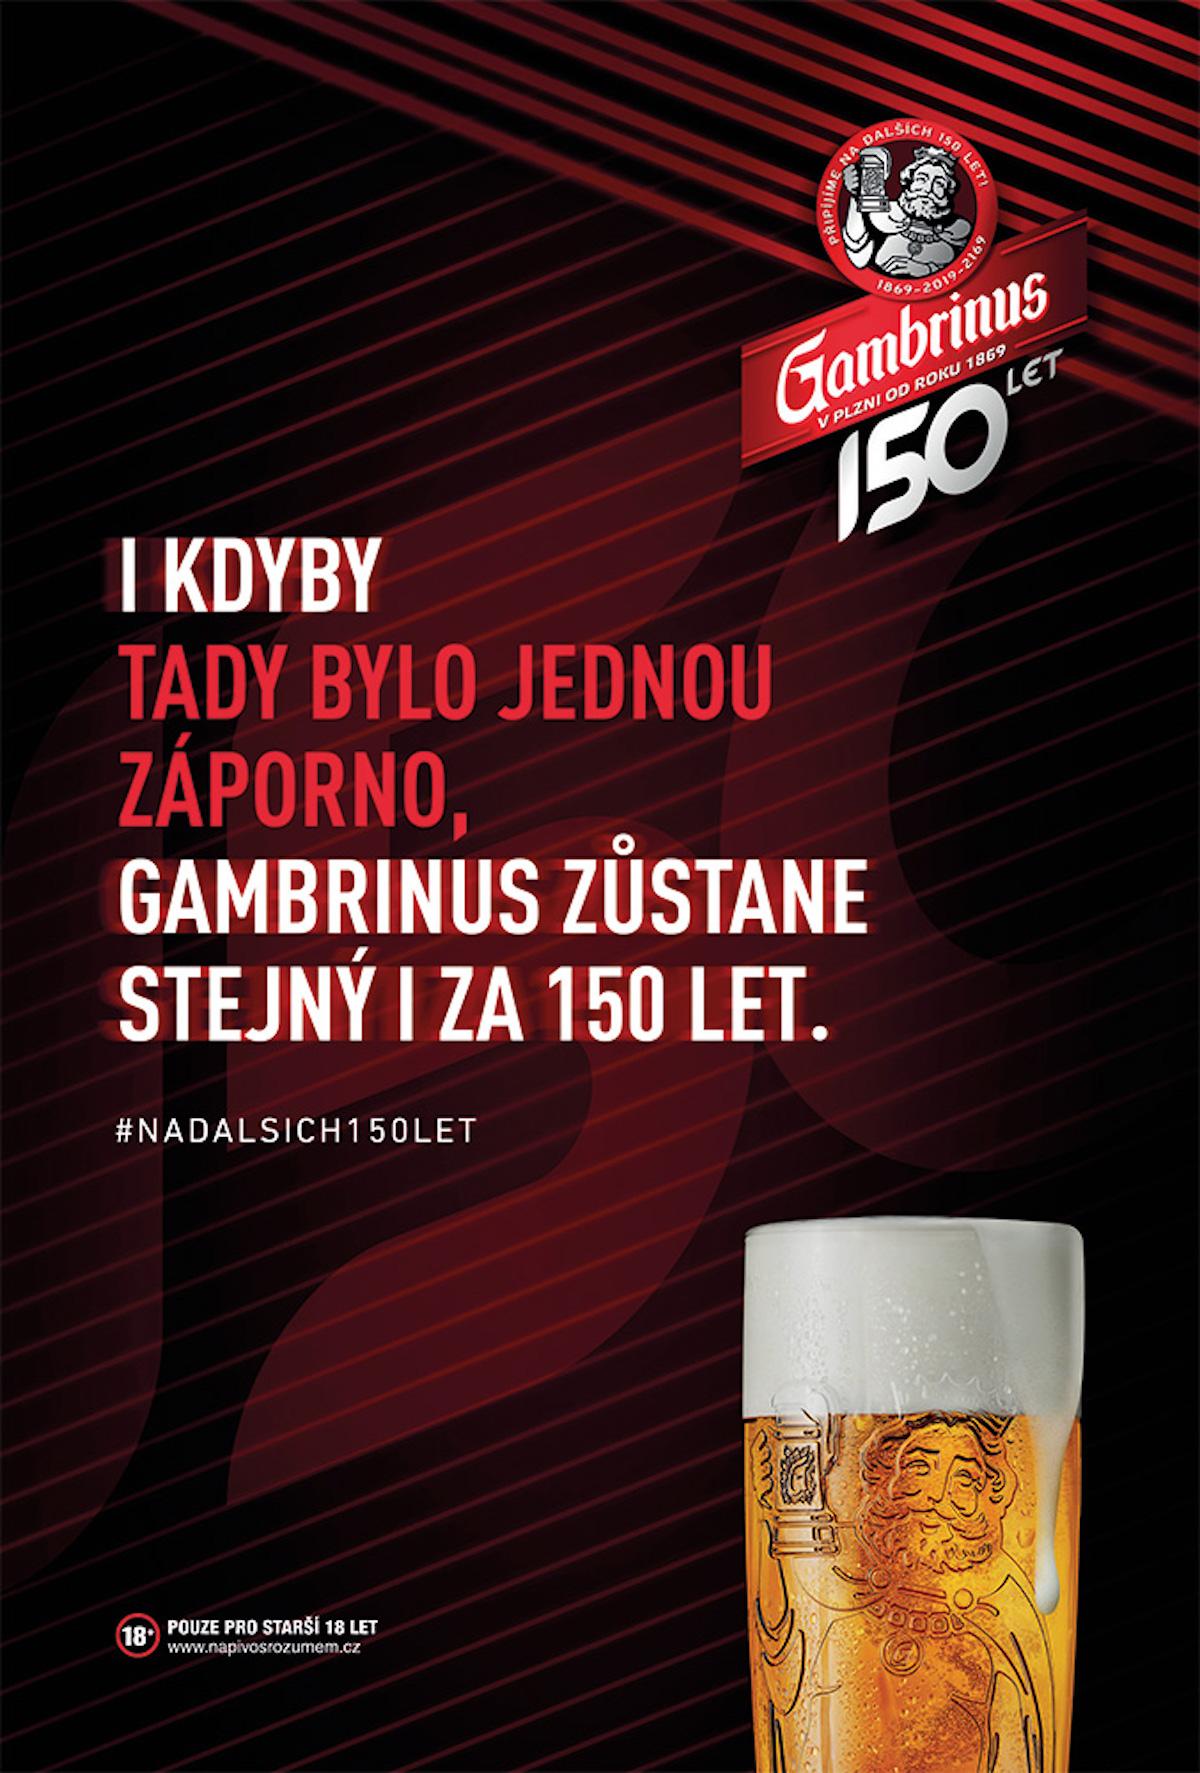 Gambrinus: I kdyby (Triad Advertising)